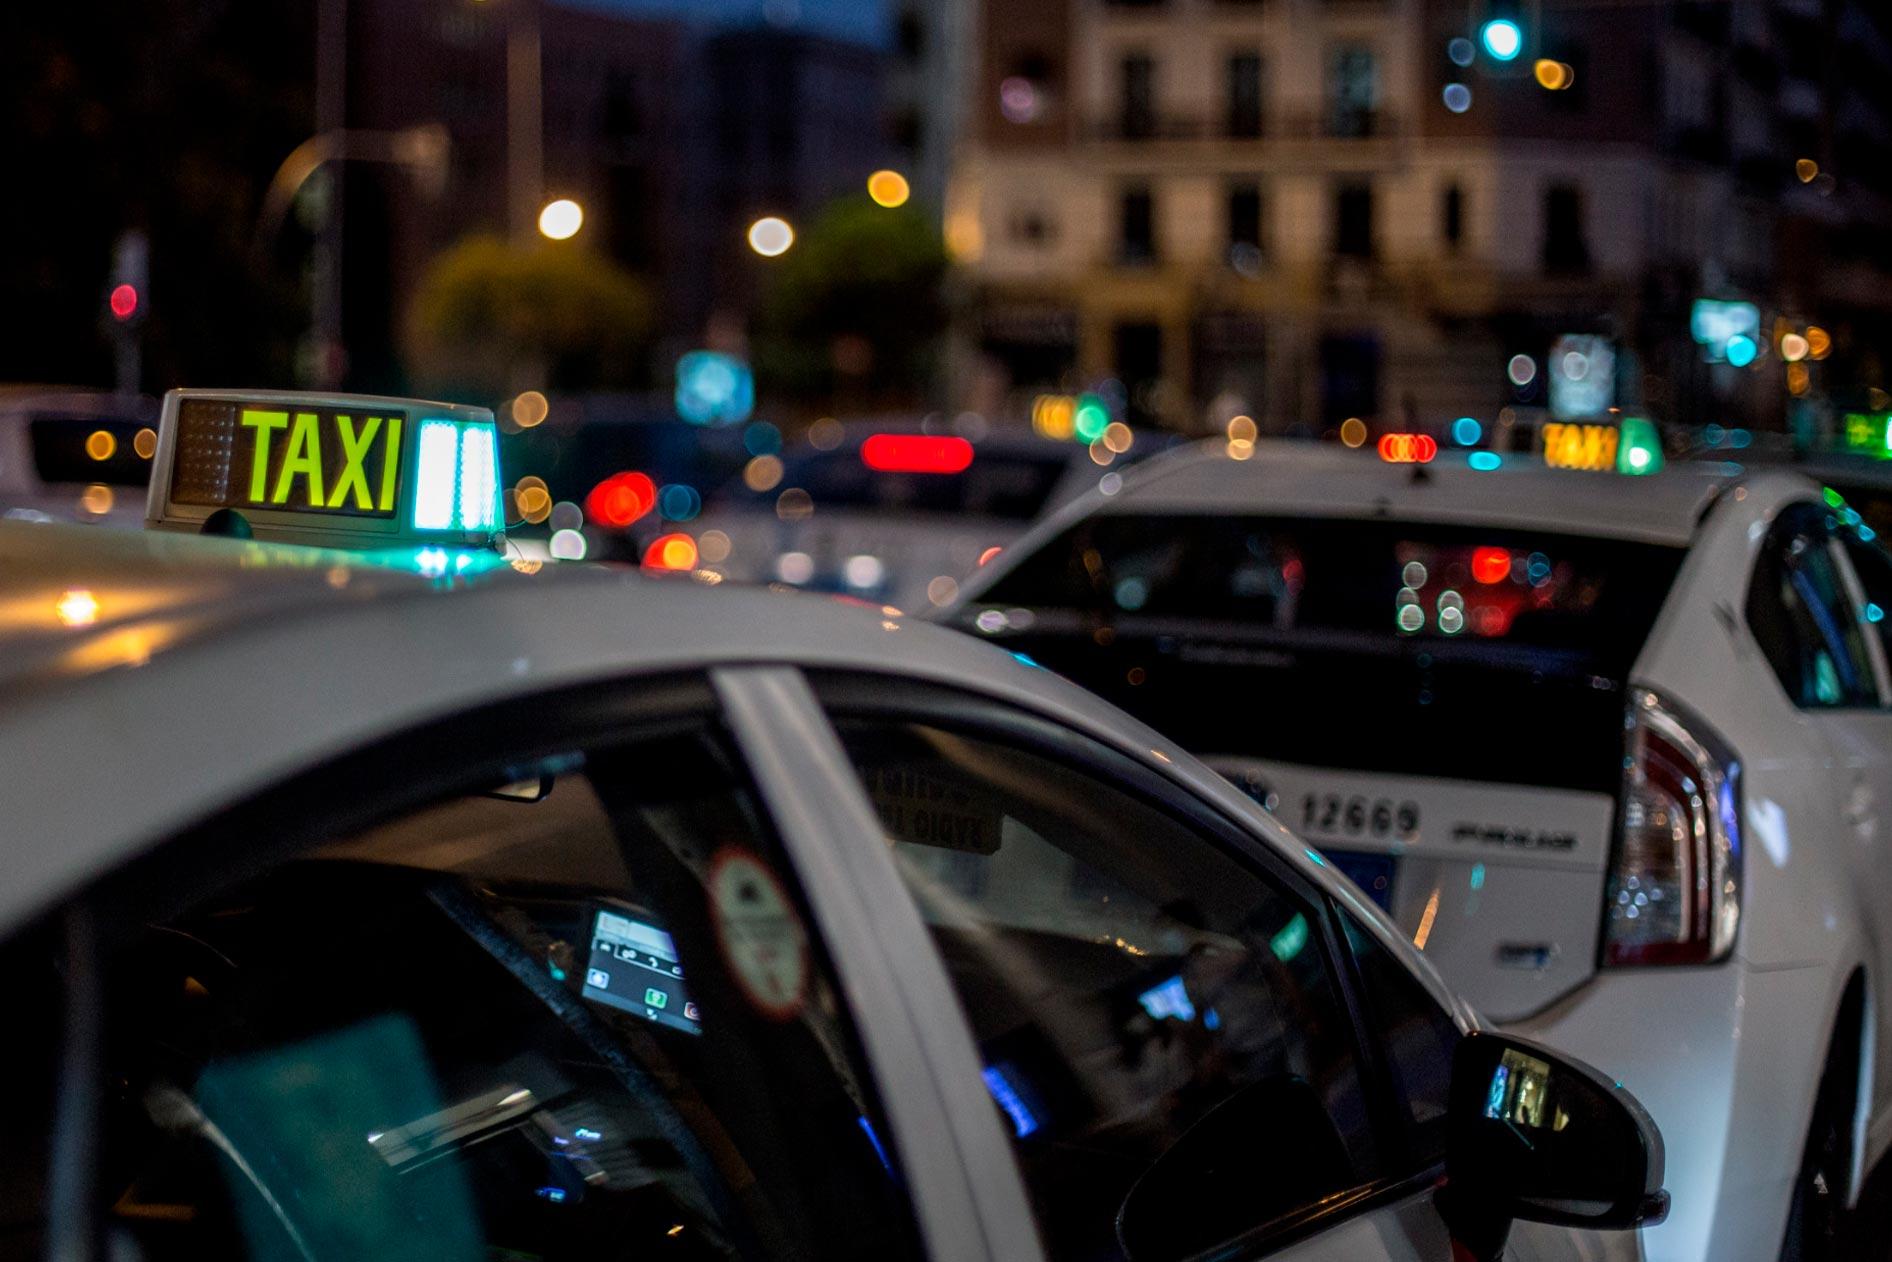 Taxi Pontevedra